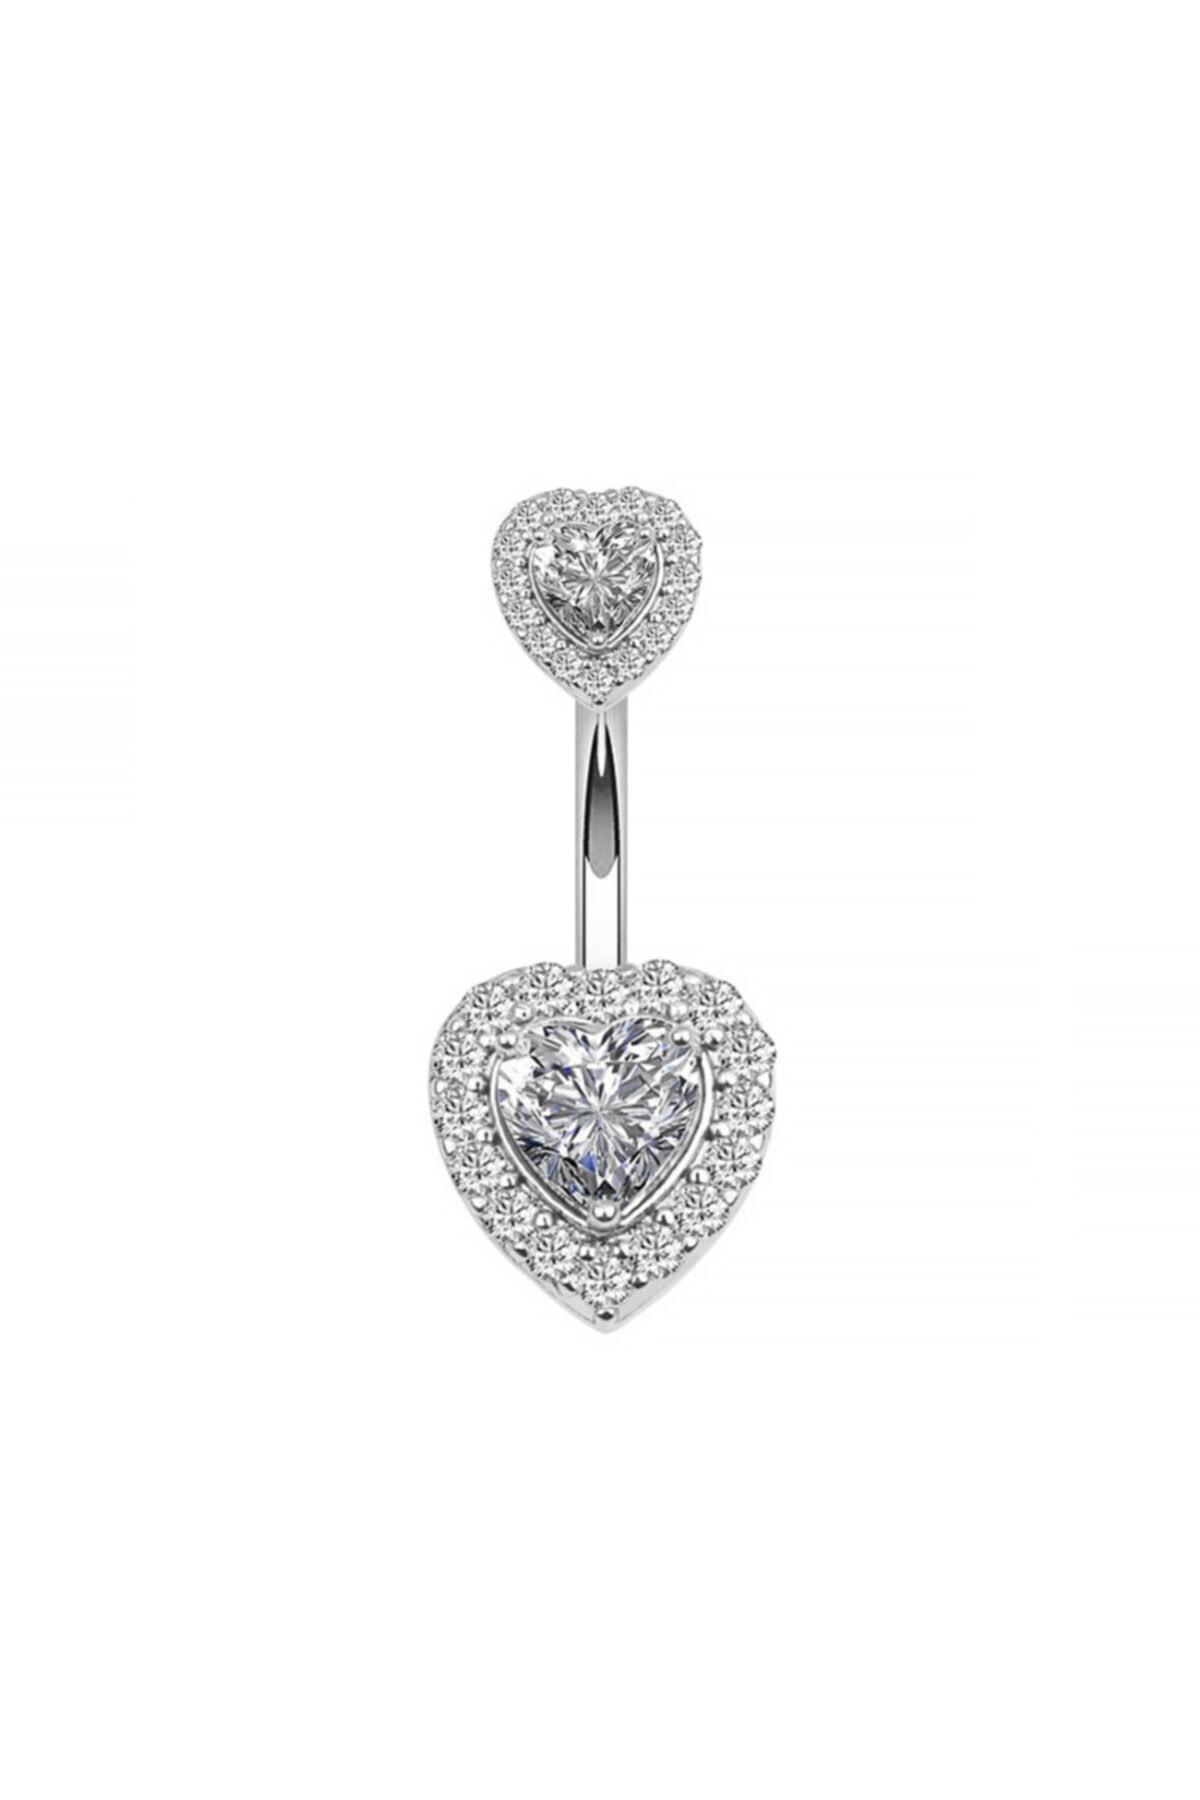 Chavin Çift Kalp Taşlı Komple Taşlı Göbek Piercing Eg58by 1